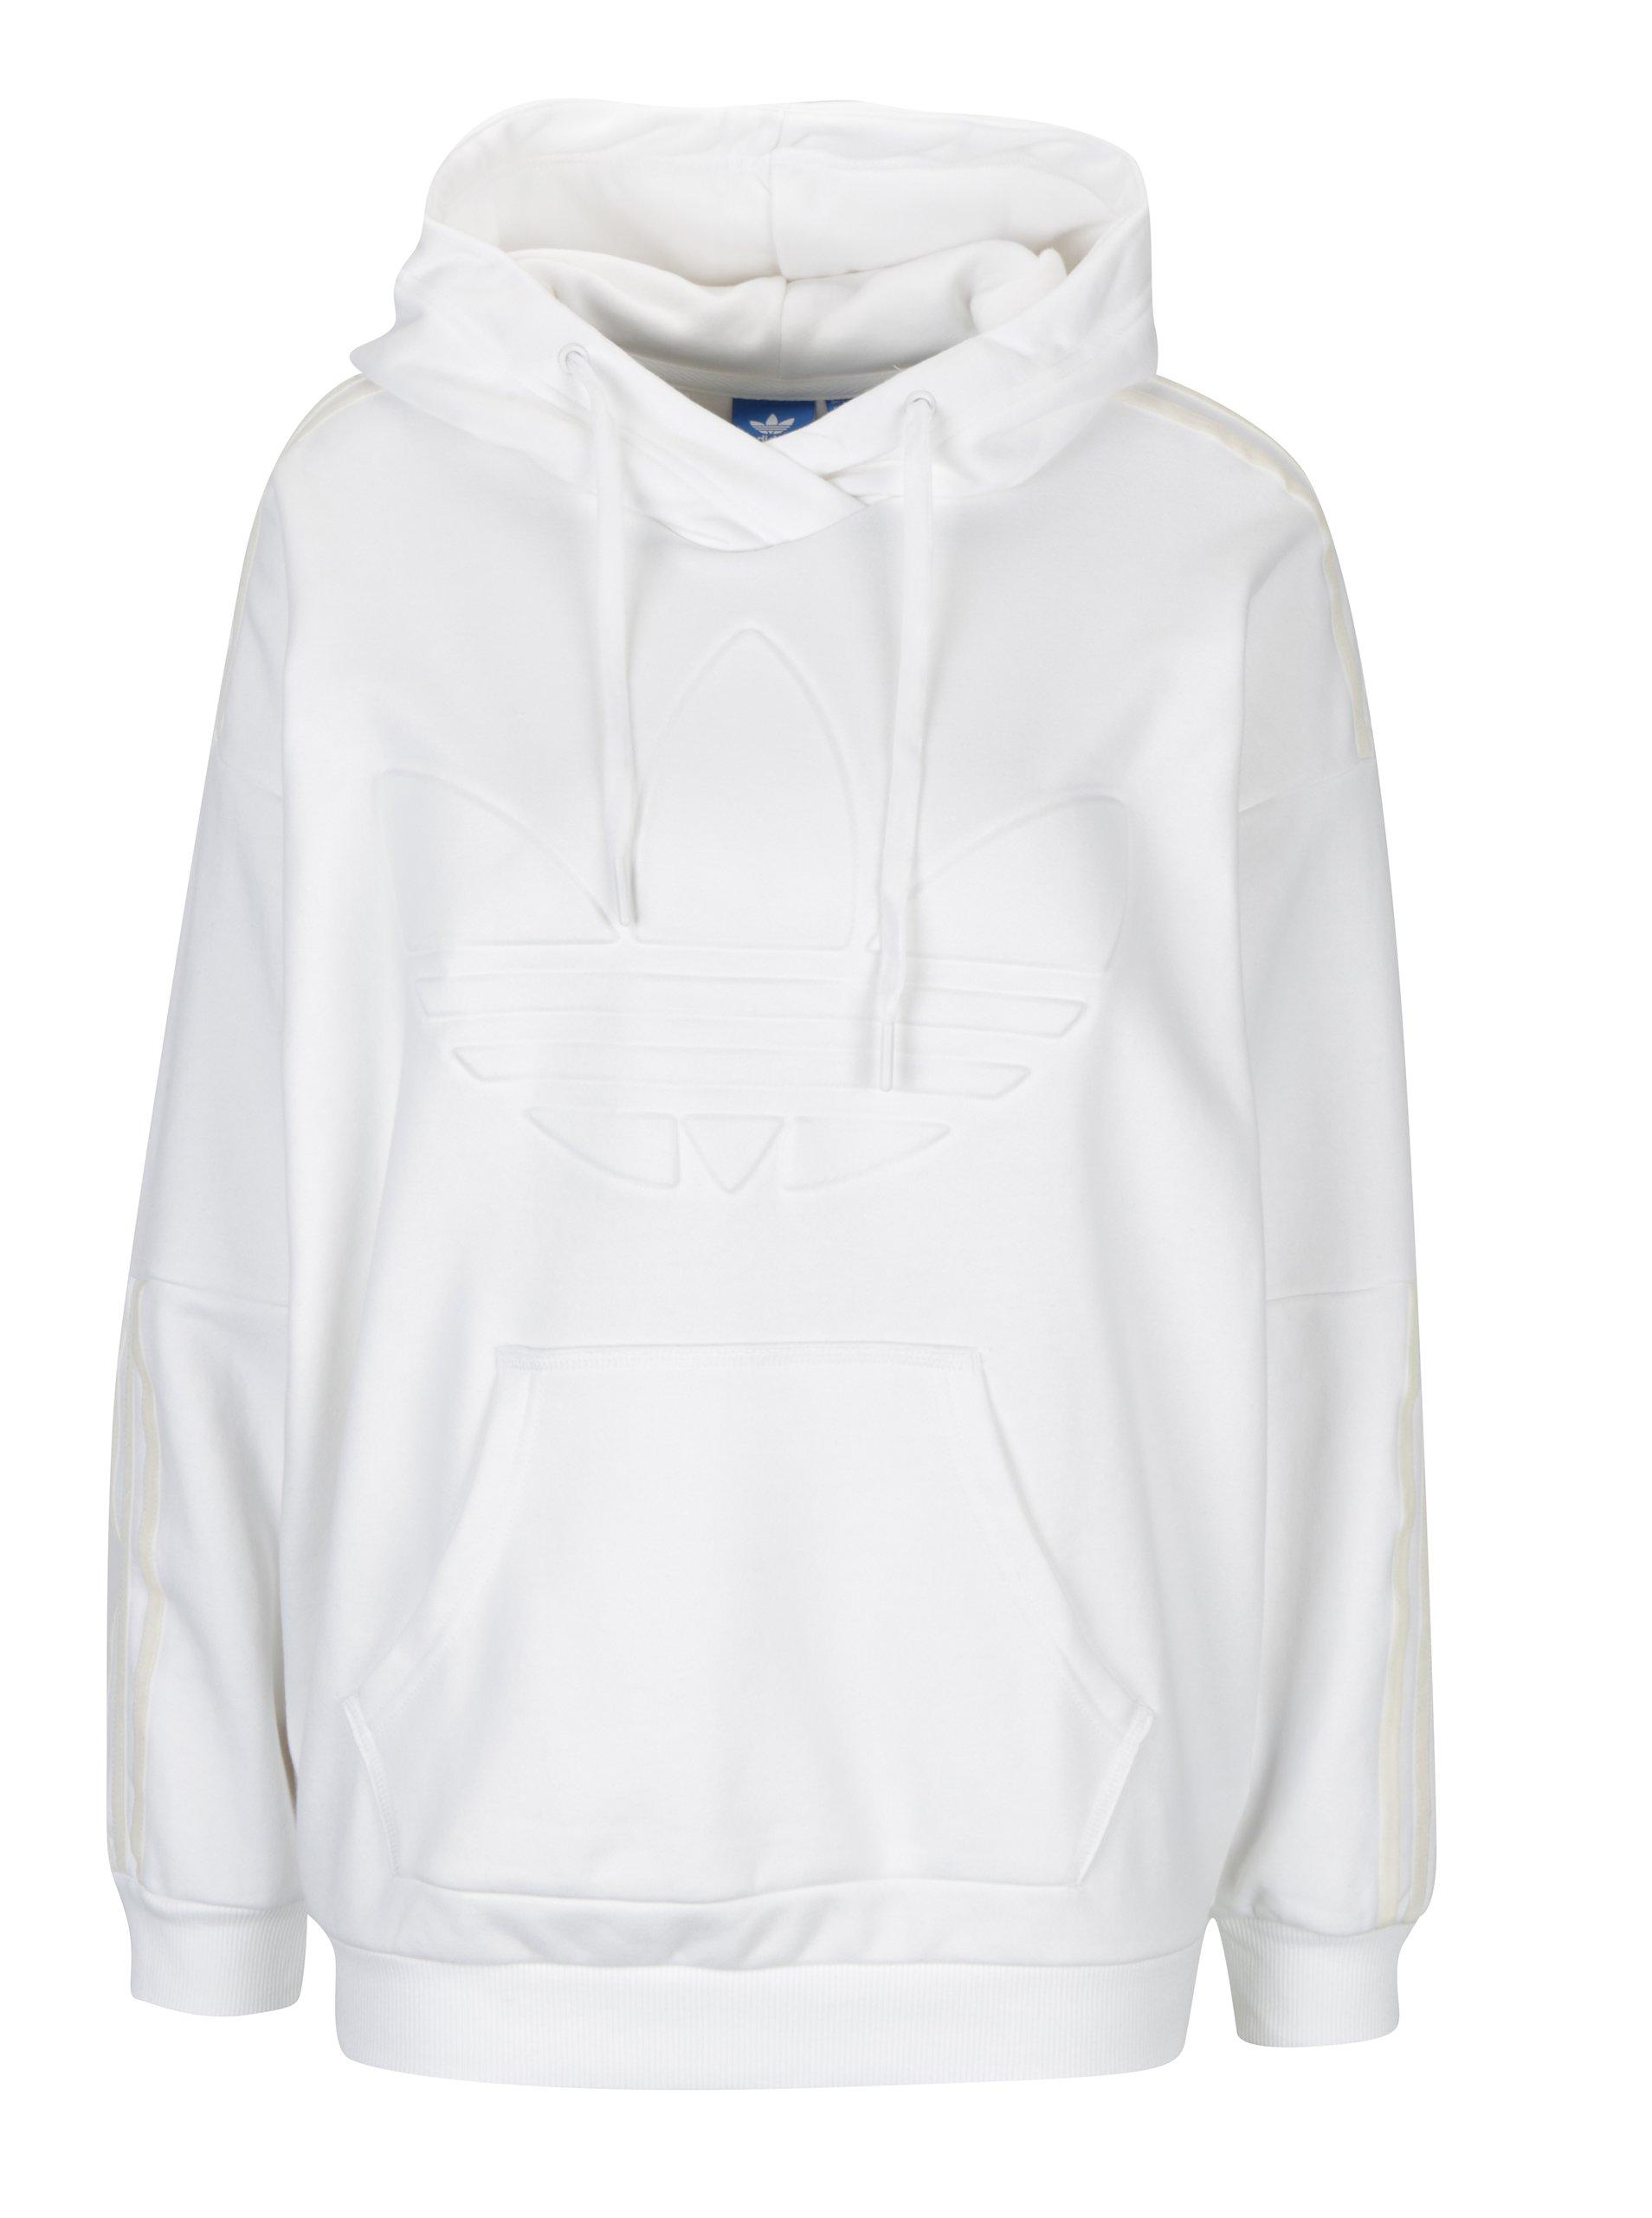 774ad81ba Biela dámska mikina s kapucňou adidas Originals   Moda.sk